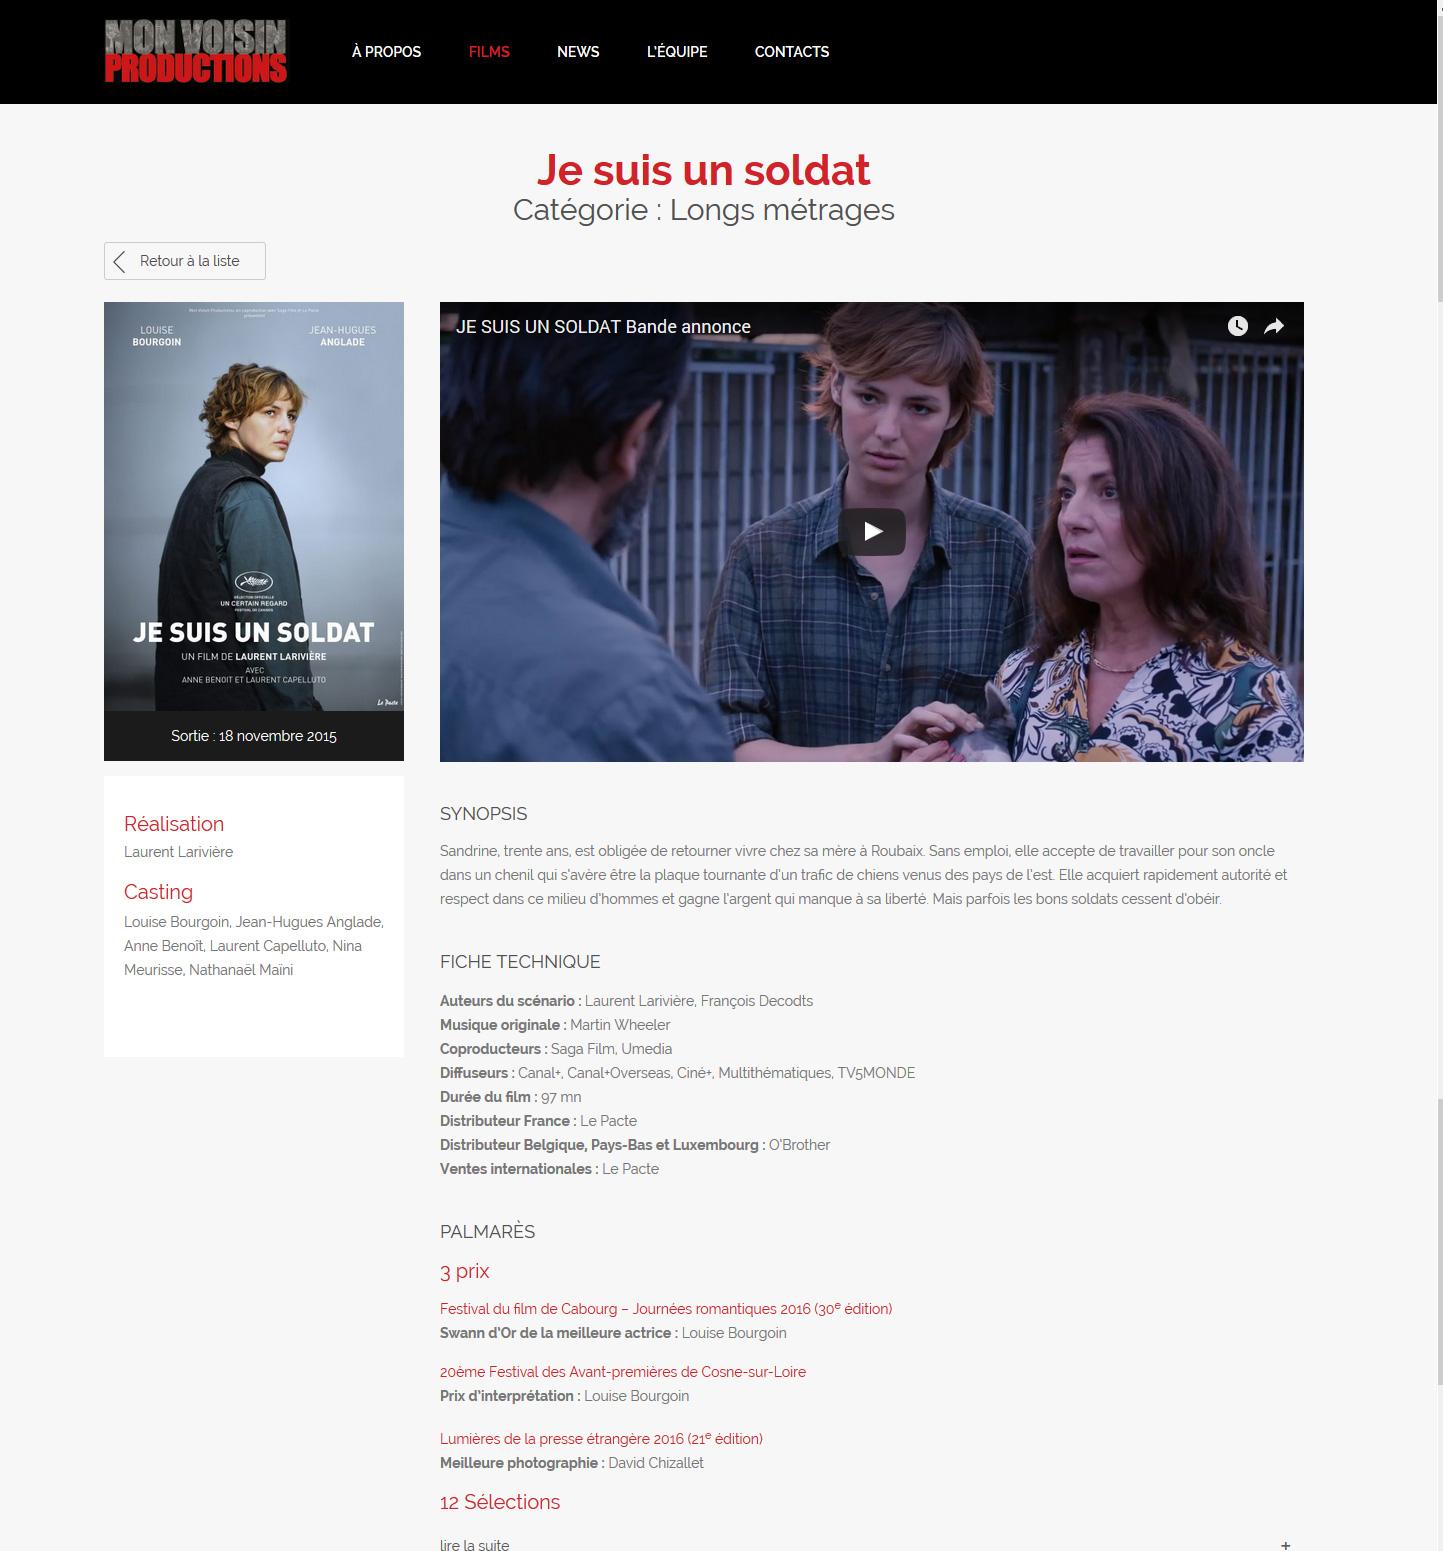 ALYS projet - Mon Voisin Productions